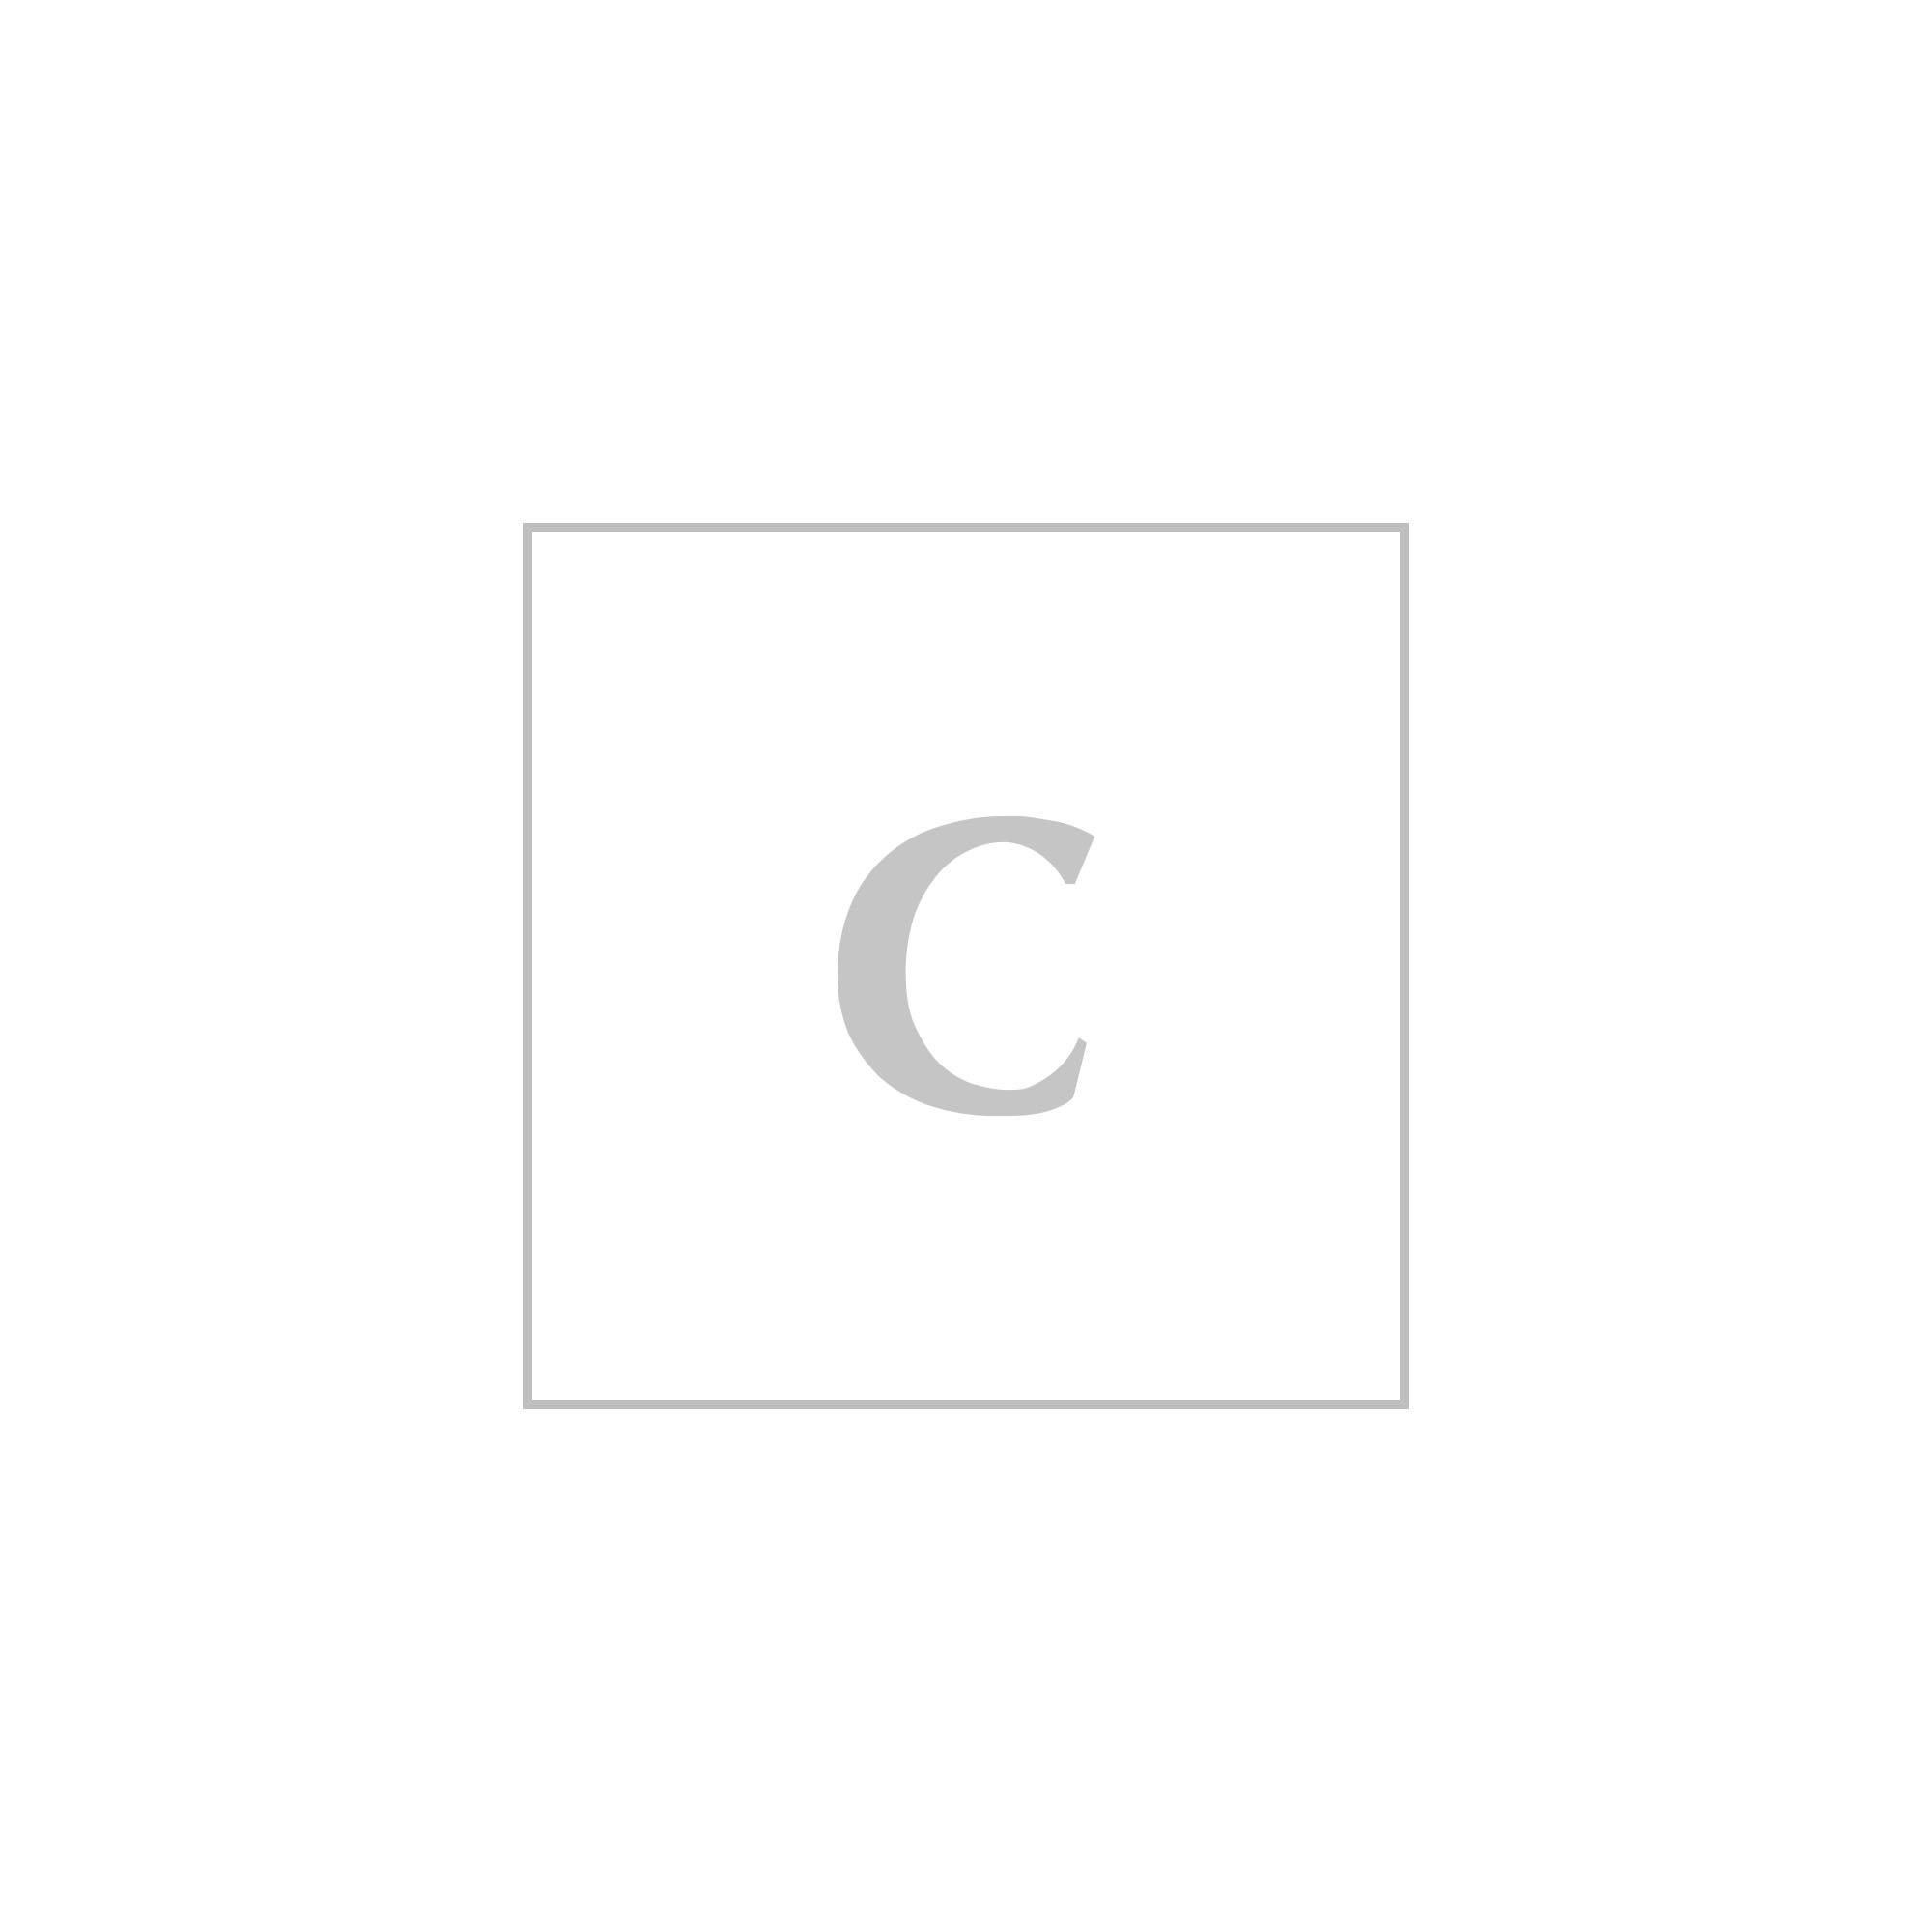 Stella mccartney borsa small tote metallic crackl